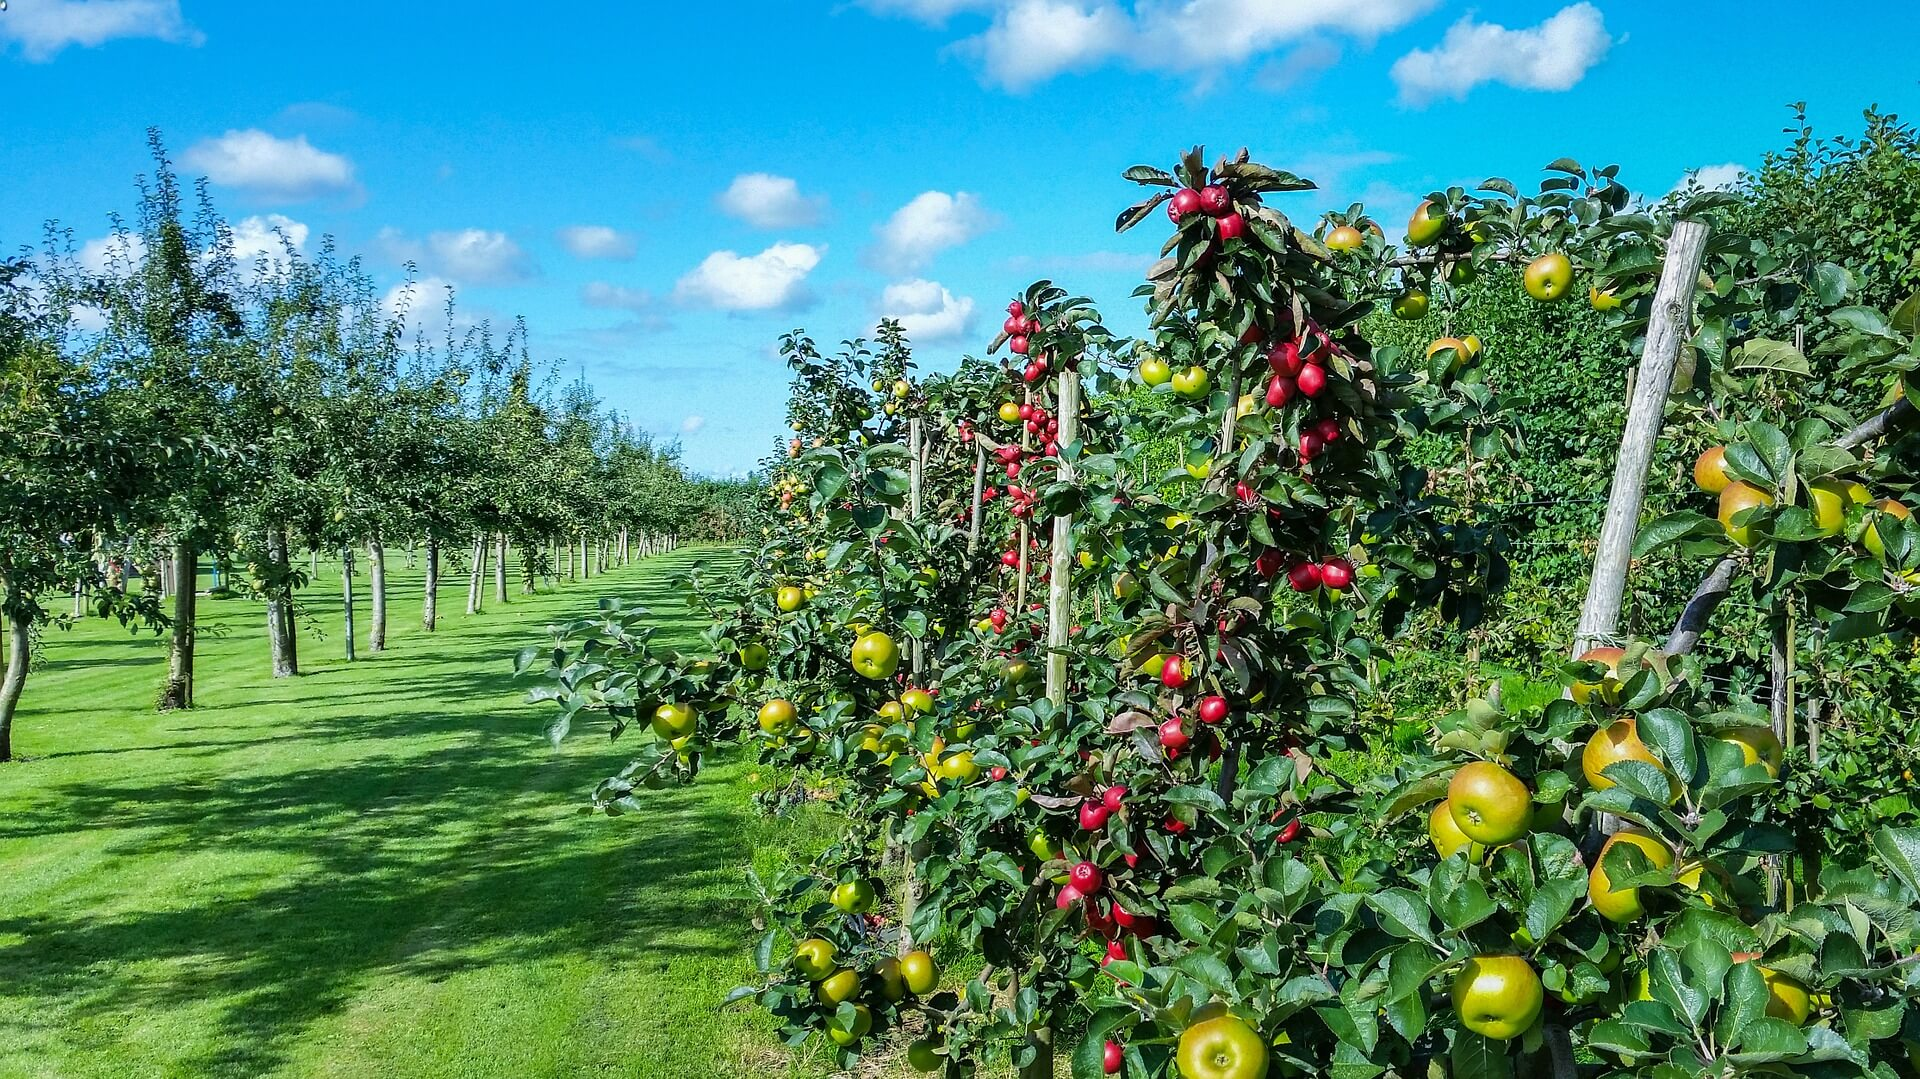 Пръскане на дръвчета в двора - Пръскане на овощни дръвчета - Rezach.bg